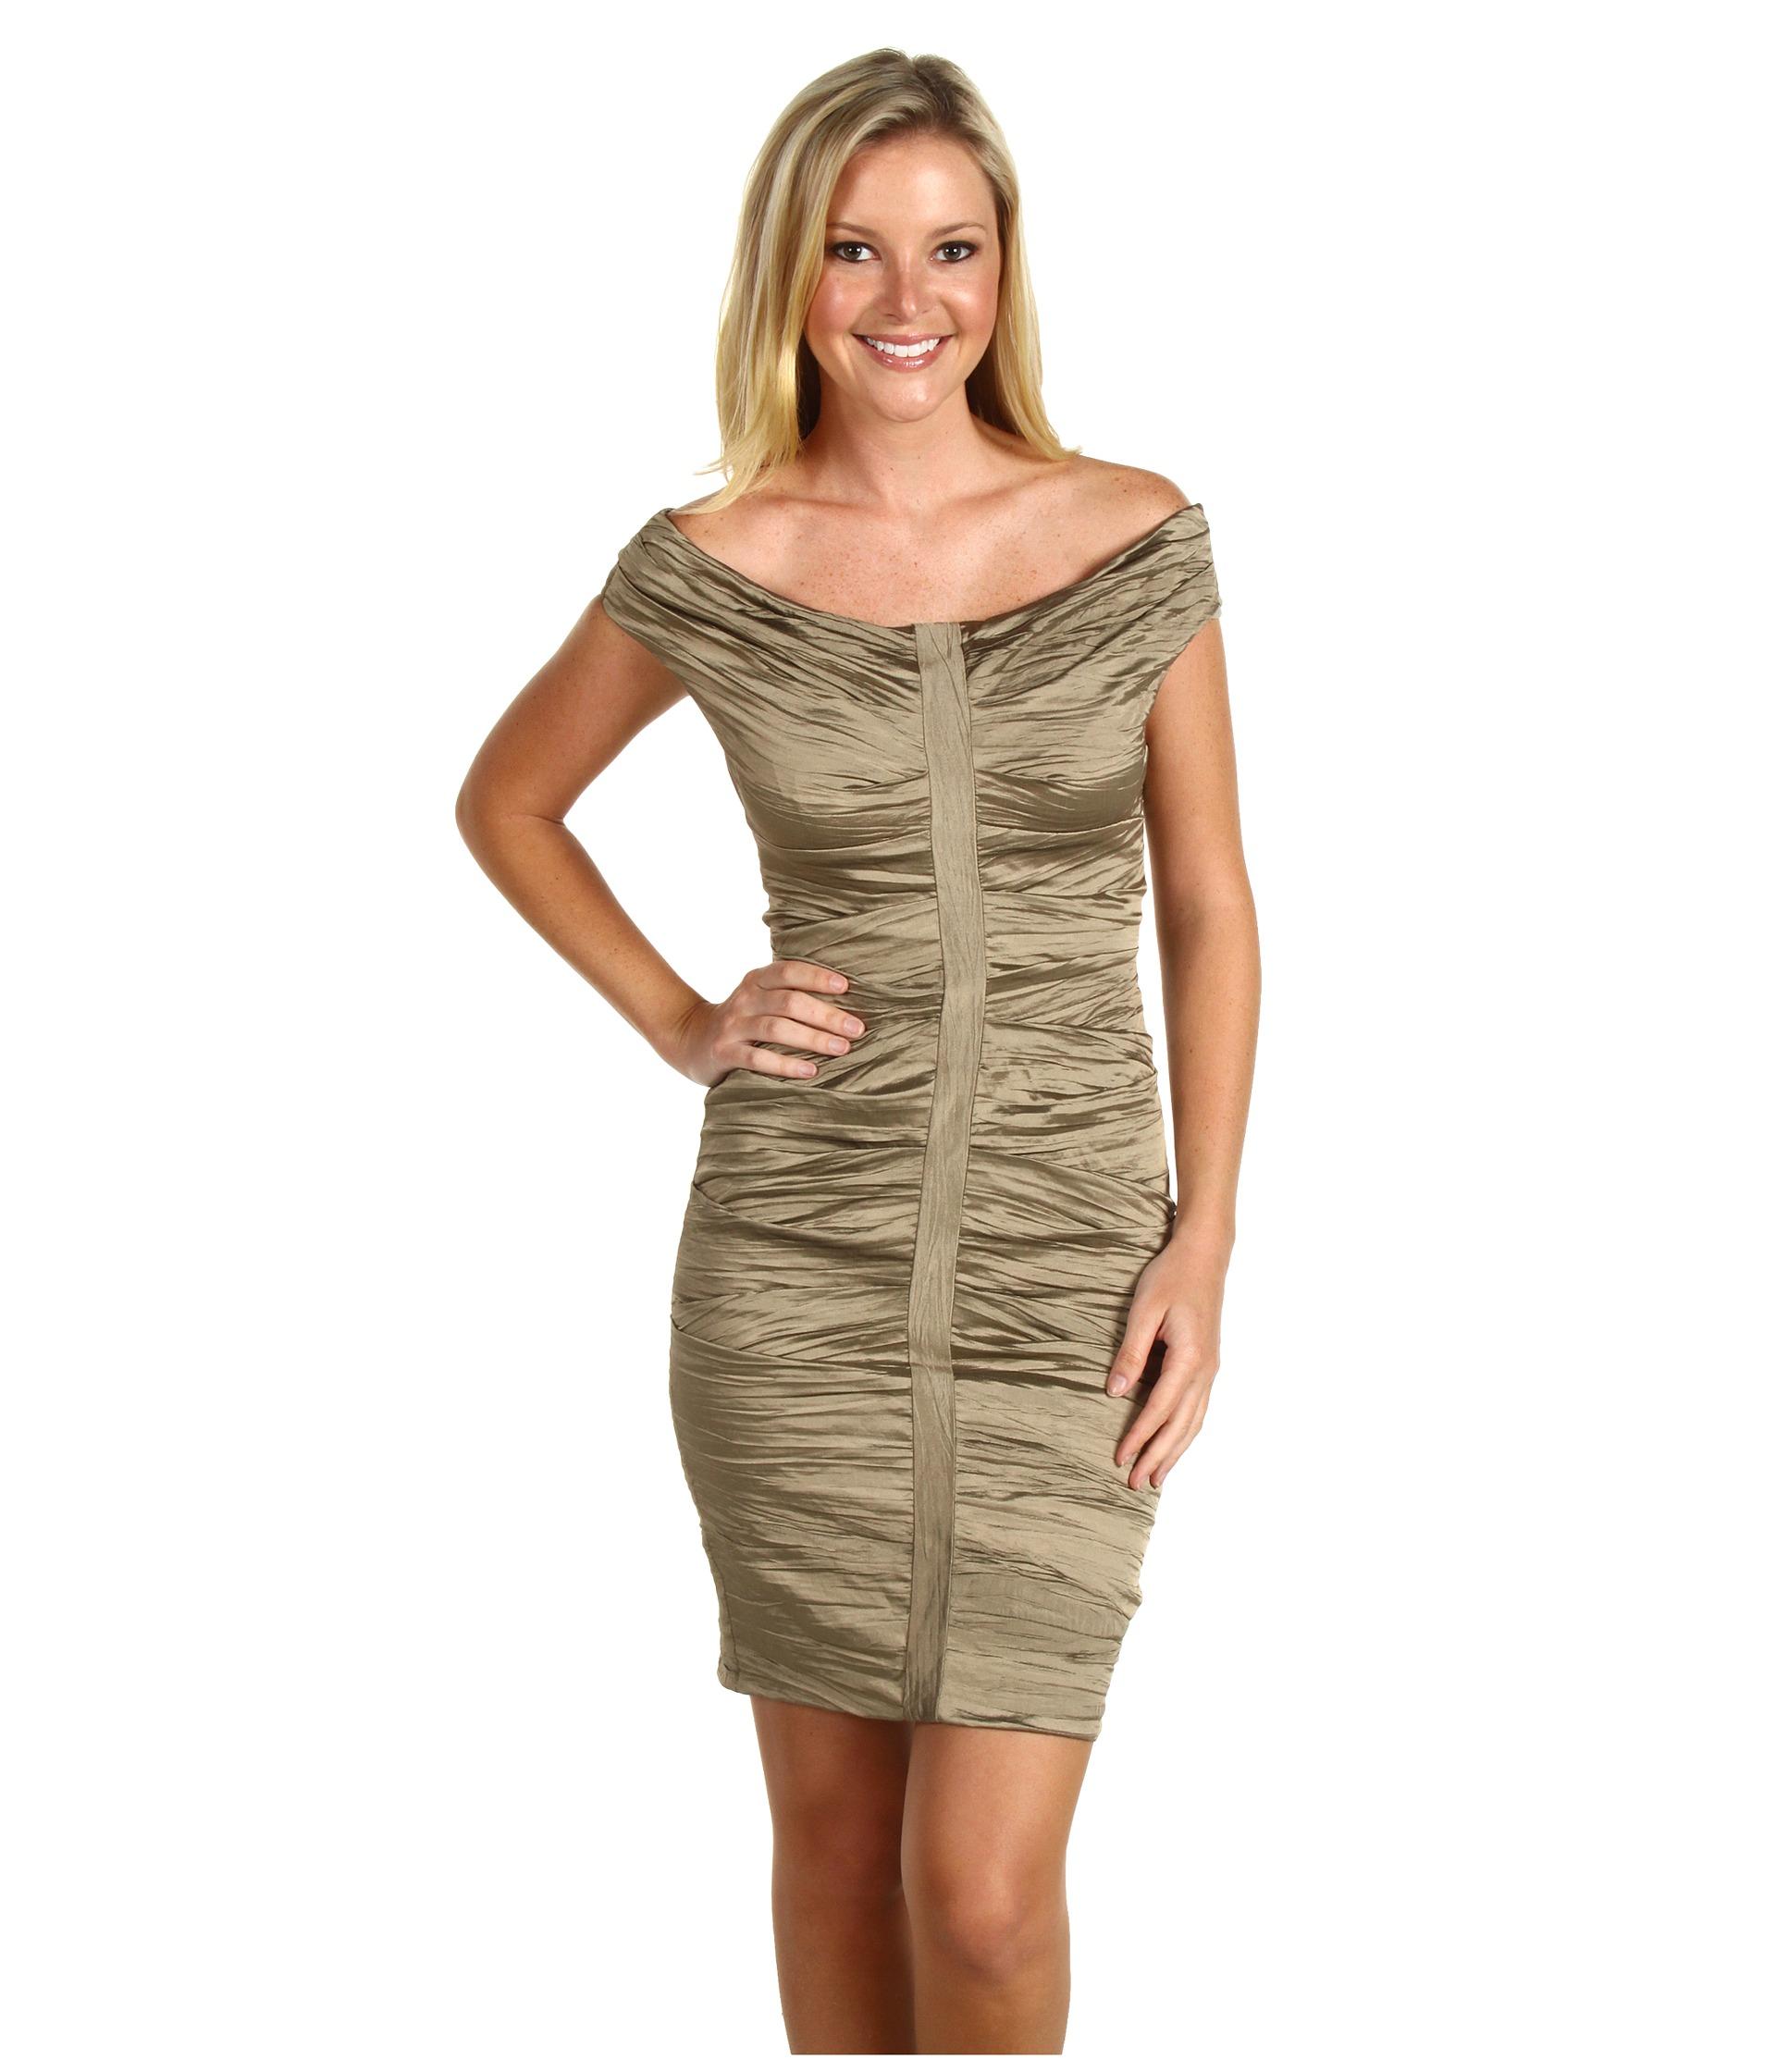 Nicole Miller Pleated Metal Dress $142.50 (  MSRP $475.00)